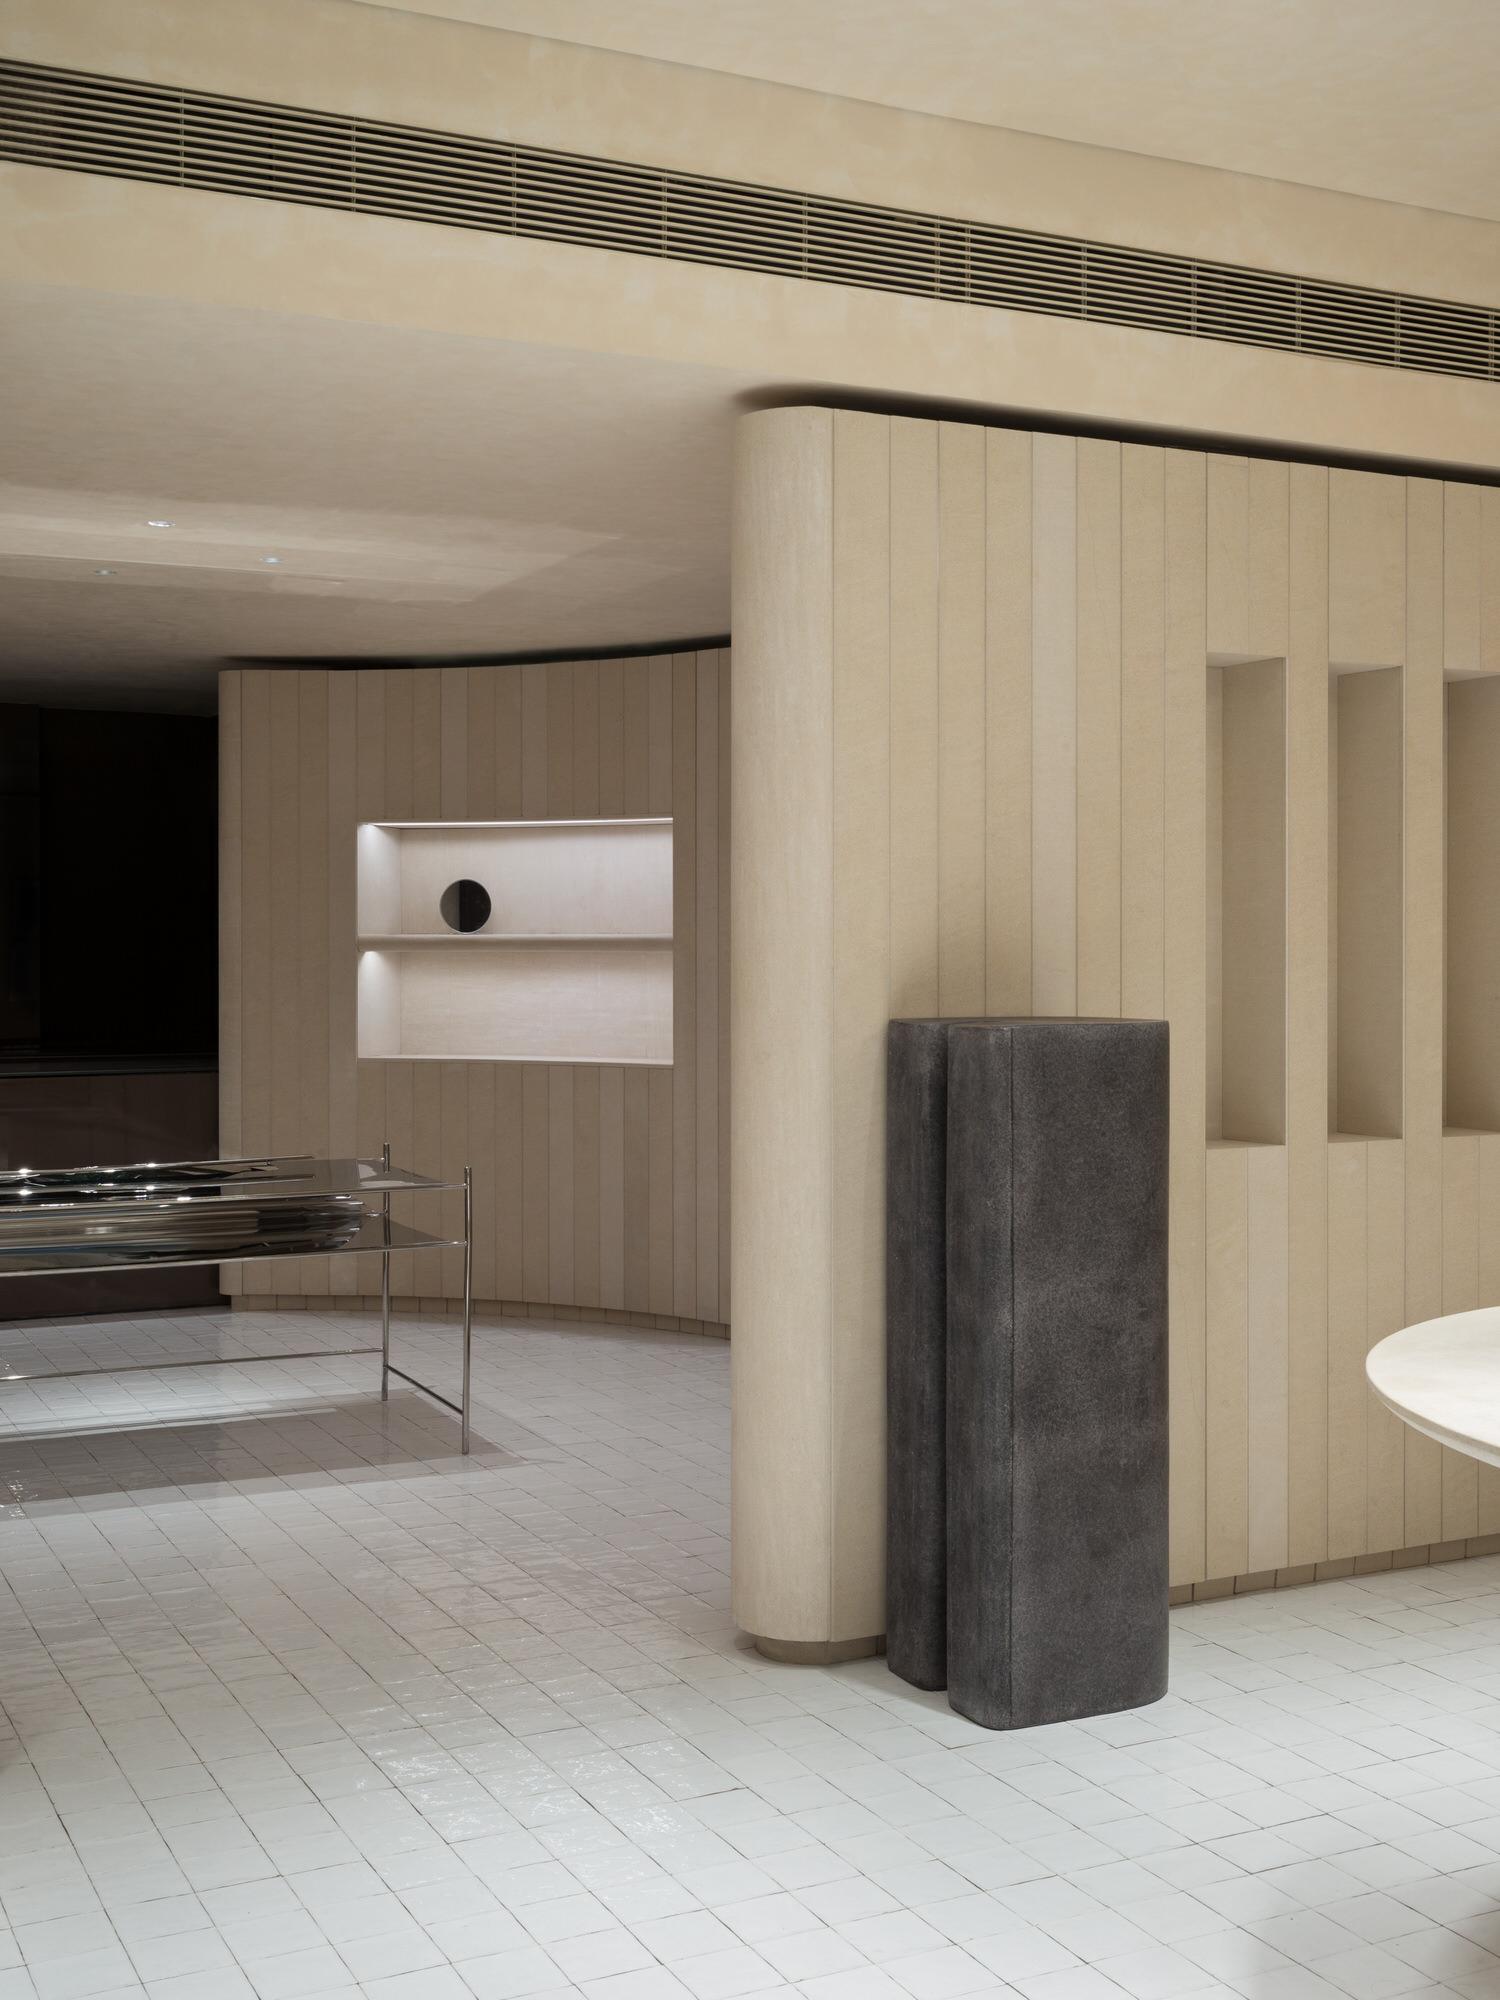 Say Architects, Parlor19 Jewellery Store Hangzhou, China Luxury Retail, Photo Minjie Wang | Yellowtrace